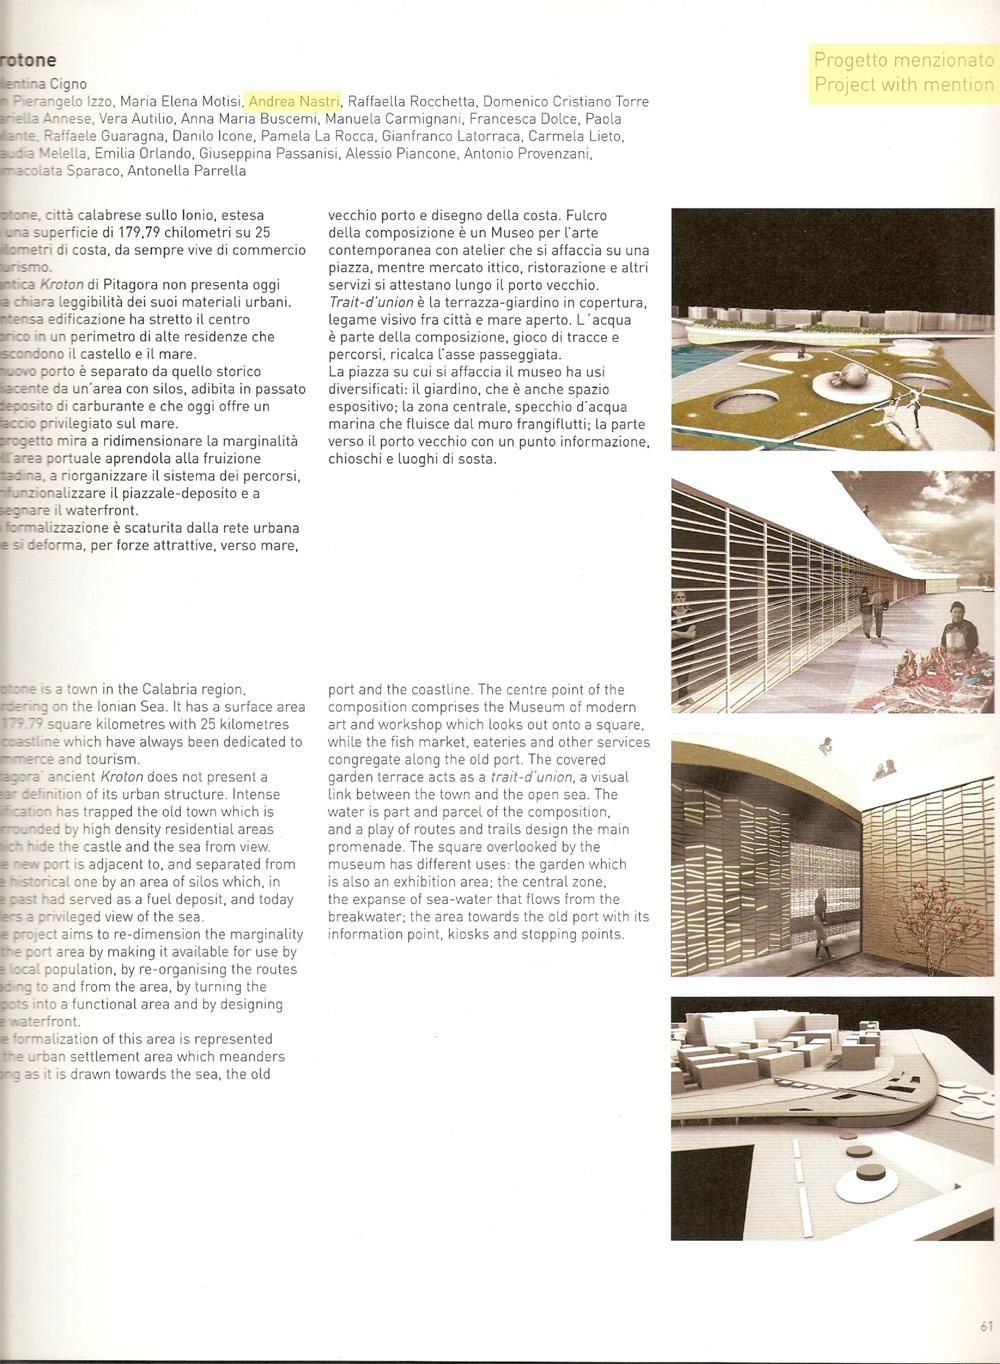 Mobili ingresso promozioni ikea catania - Ikea padova catalogo ...